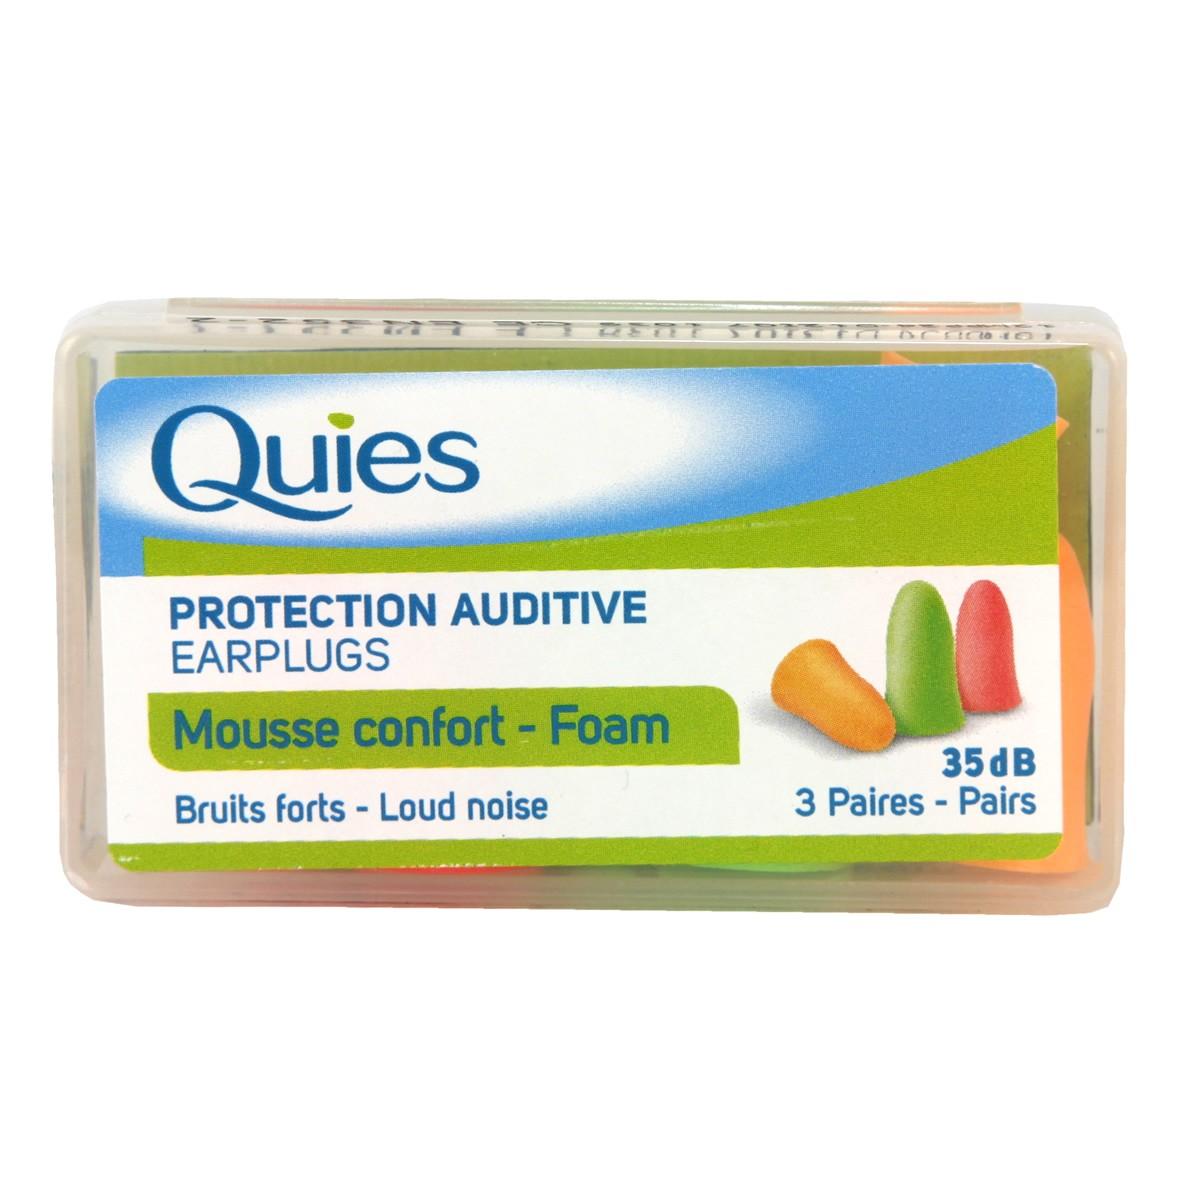 Quies Protective Auditive Earplugs Mousse Comfort - Foam